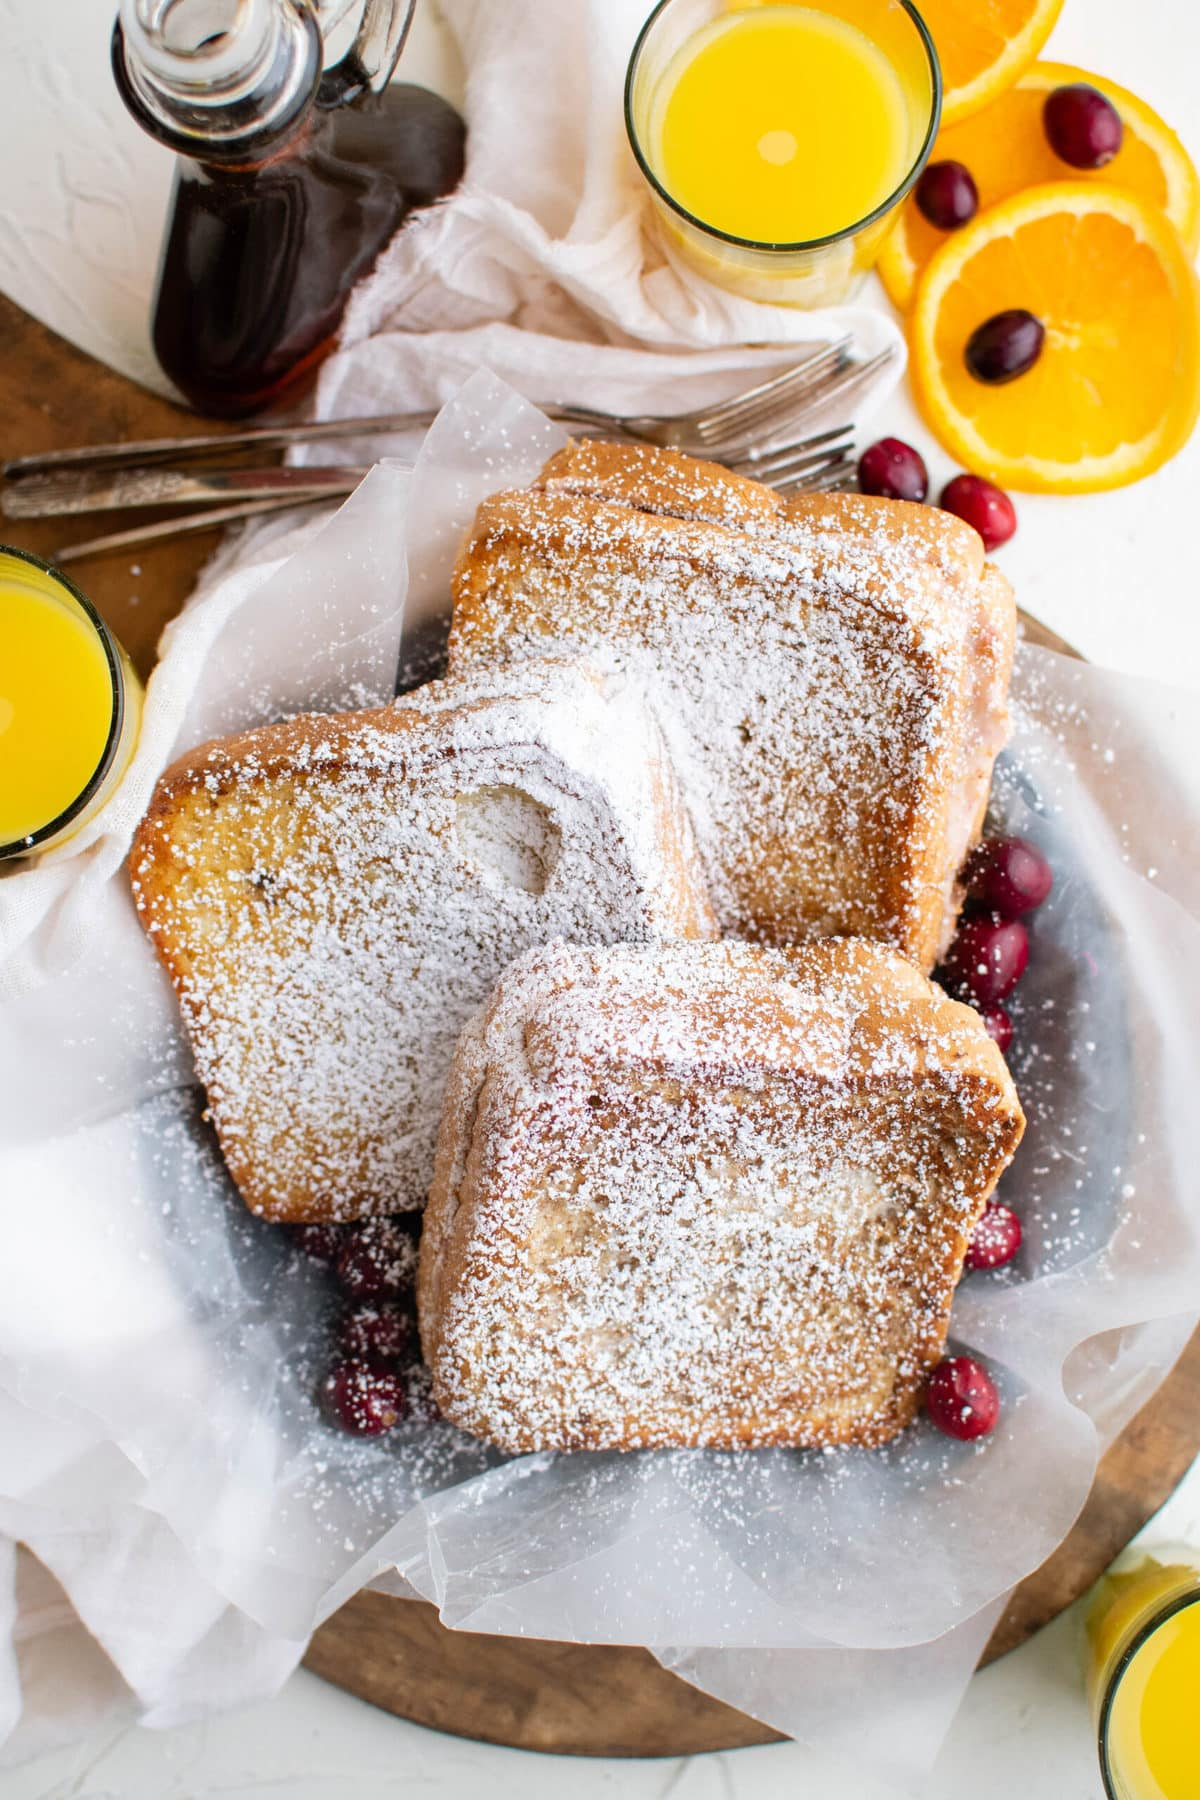 white napkin, powdered sugar covere french toast sandwiches, cranberries, orange slices, orange juice